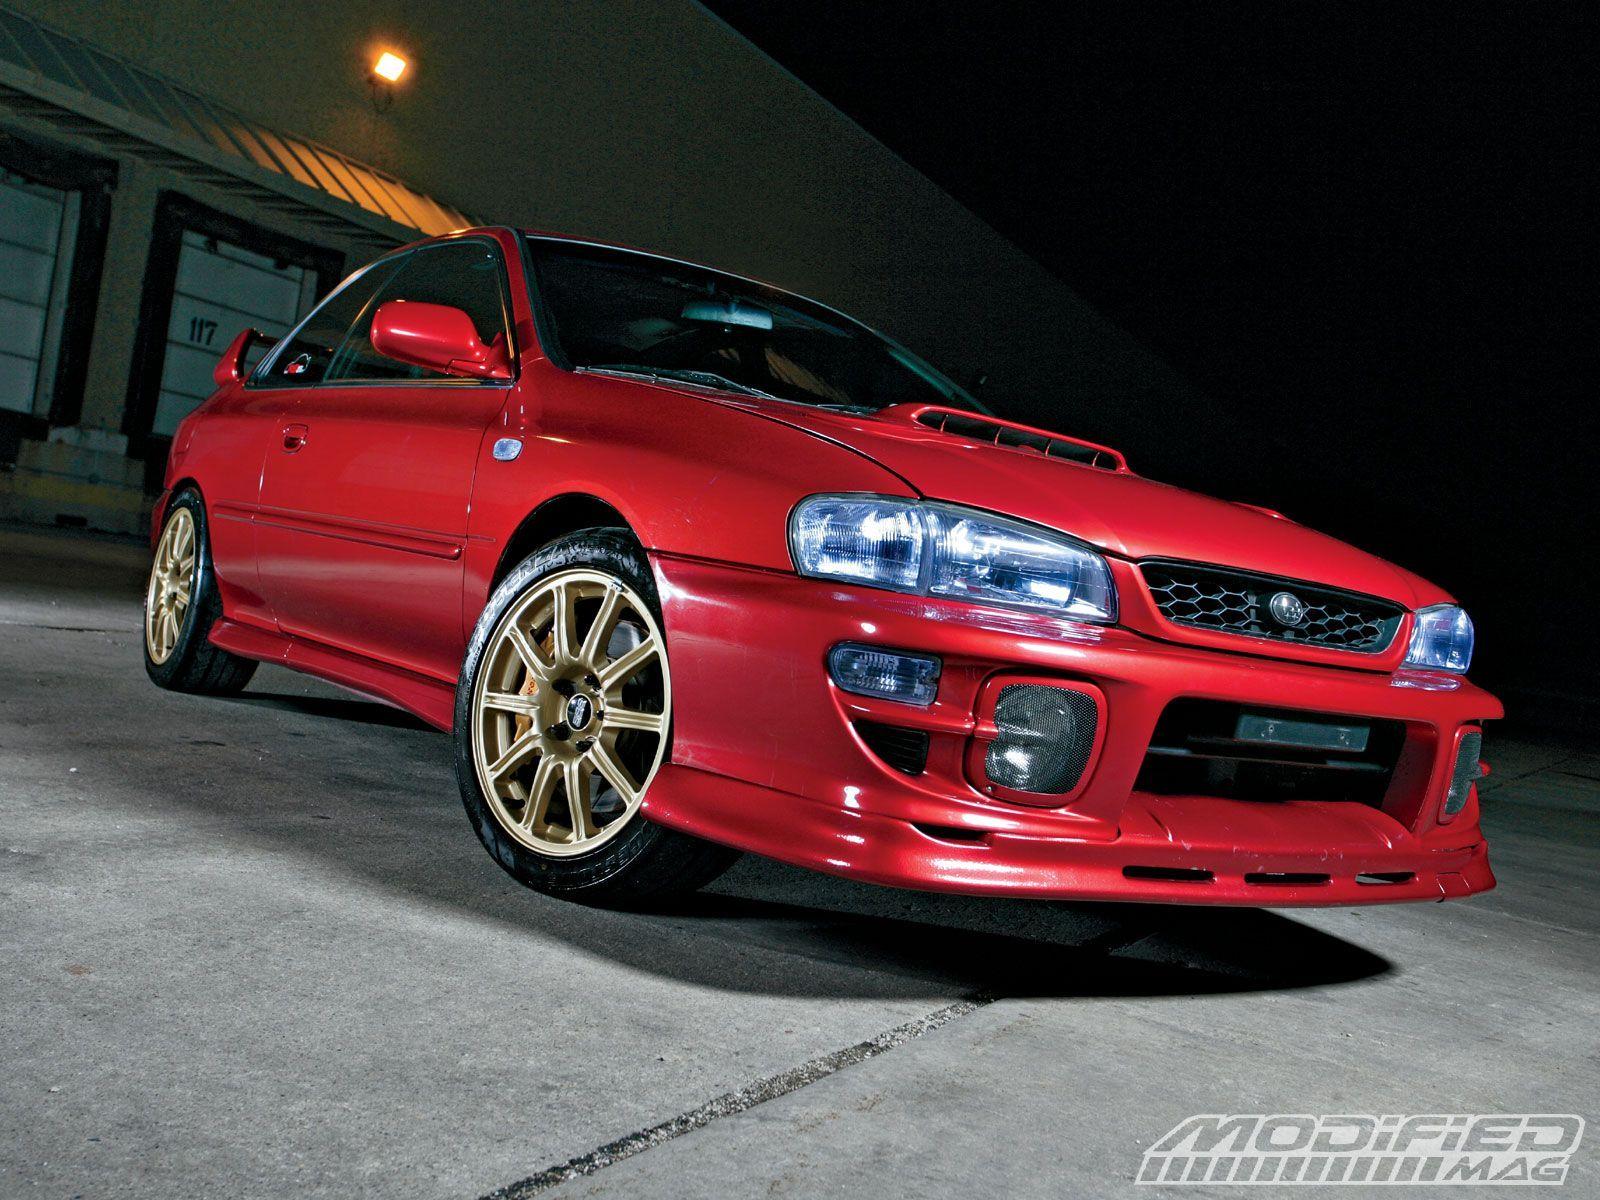 2000 Subaru Impreza 2 5 Rs Subaru Subaru Impreza Retro Cars